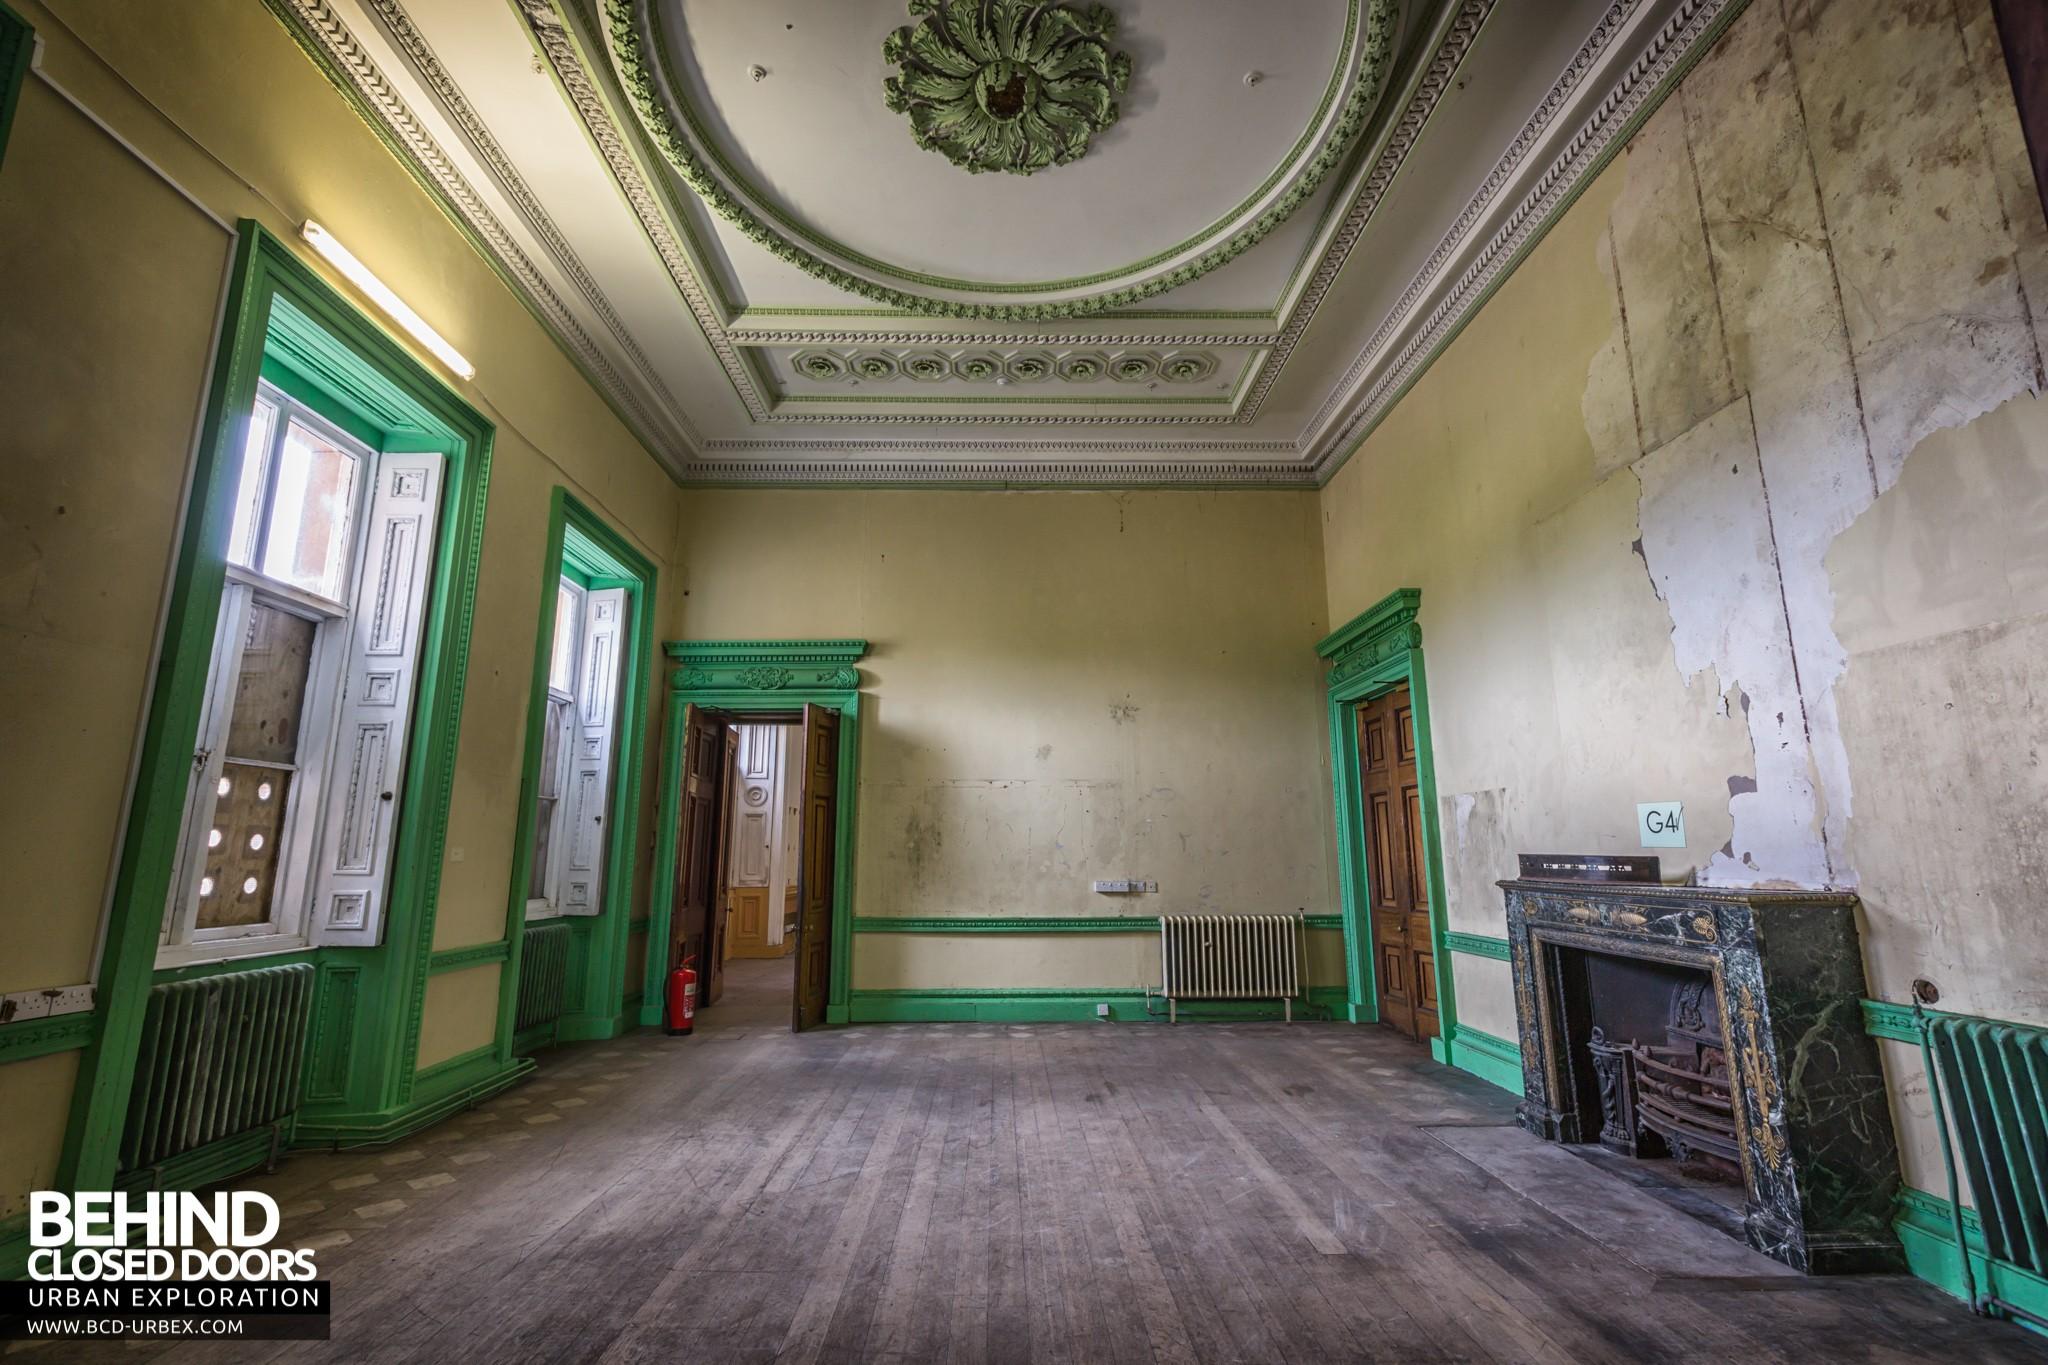 Tottenham House Wiltshire Uk 187 Urbex Behind Closed